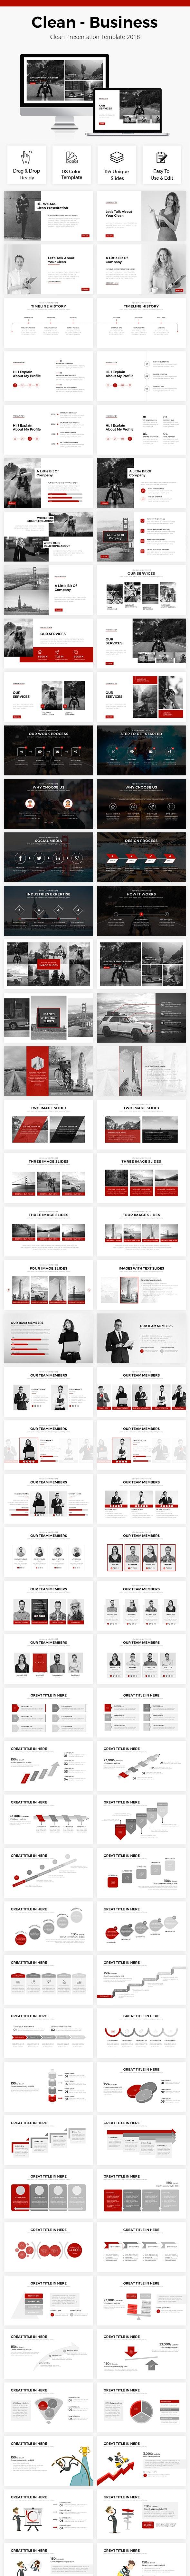 Business Presentation Template 2018 - Business PowerPoint Templates